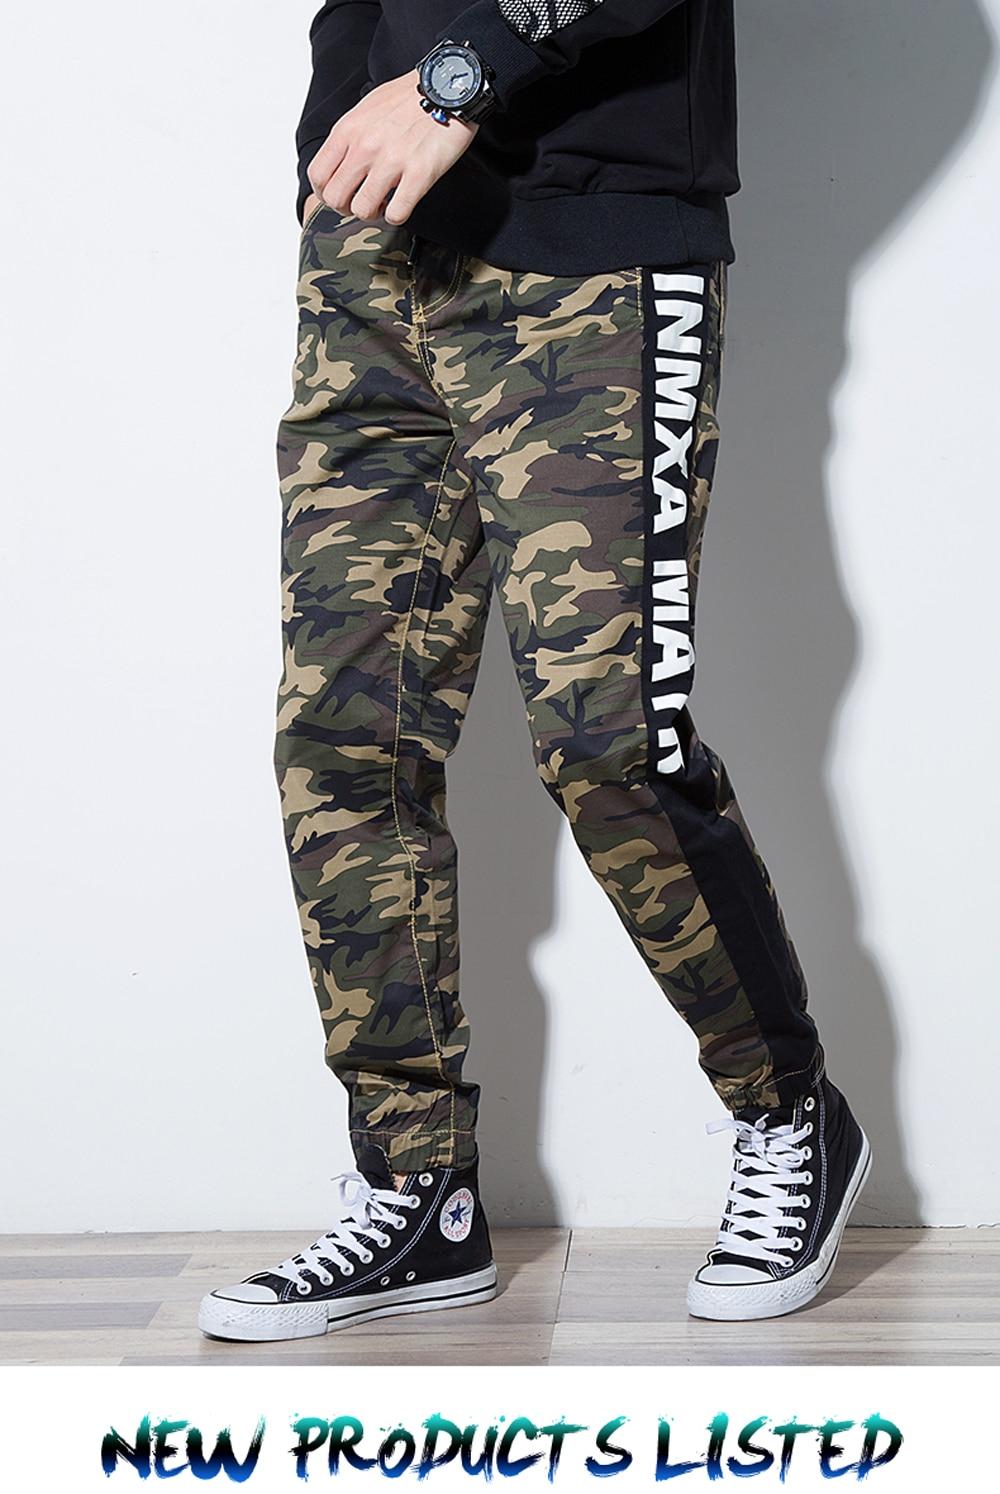 b5ebb8309 € 28.15 40% de DESCUENTO|Aliexpress.com: Comprar 2019 nuevos pantalones  vaqueros de hombre de moda de camuflaje elástico Harem Demin pantalones ...